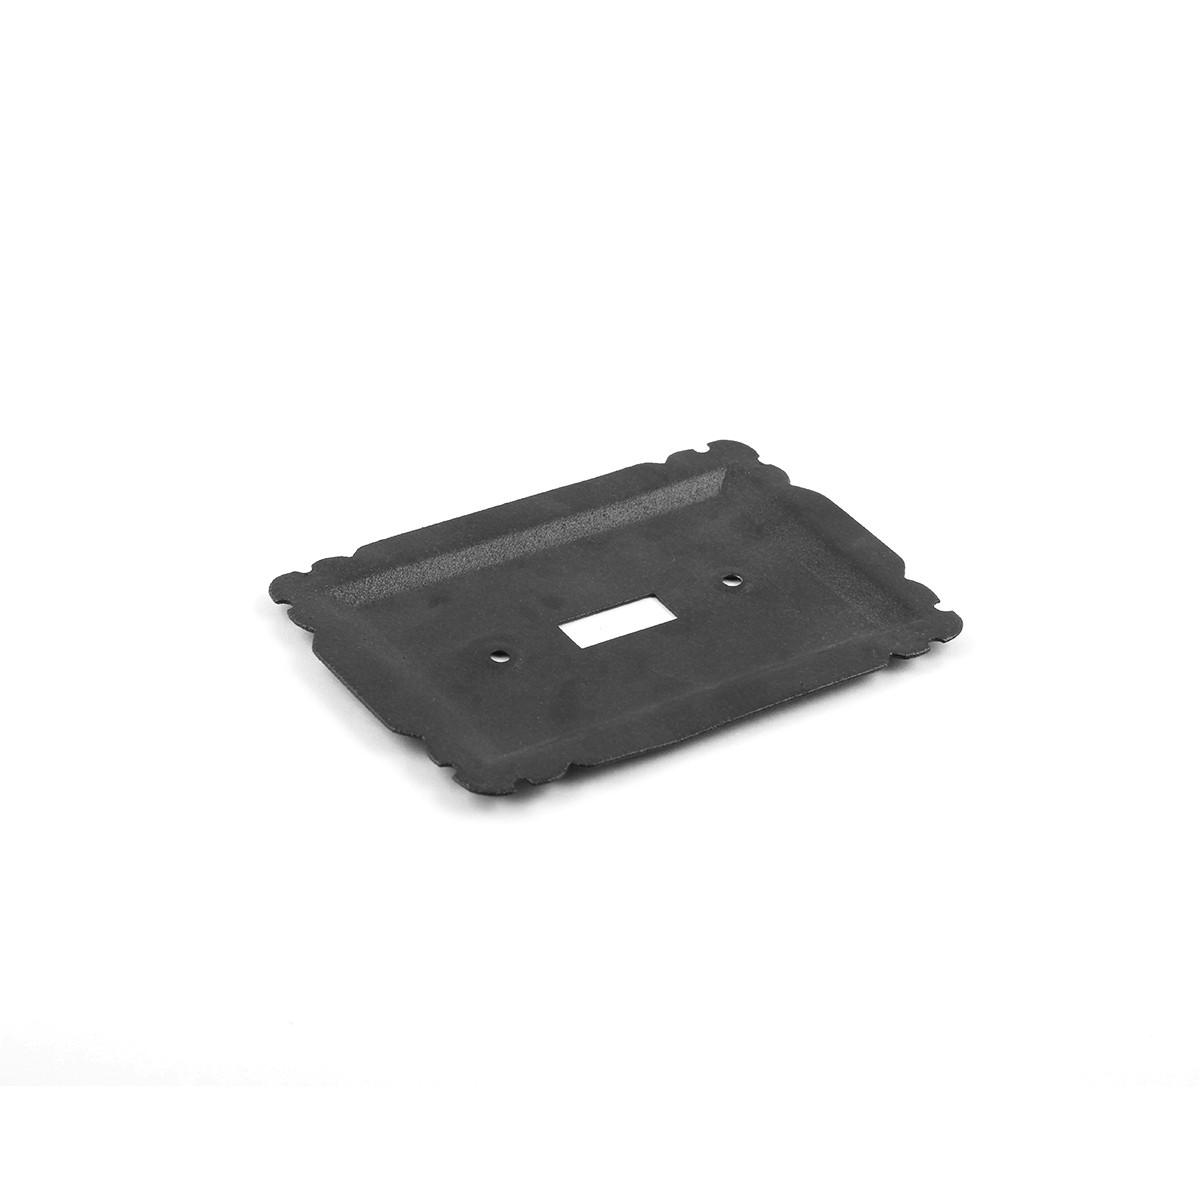 Switchplate Black Steel Single Toggle Switchplate Covers Black Switchplates And Outlet Covers Decorative Switchplates